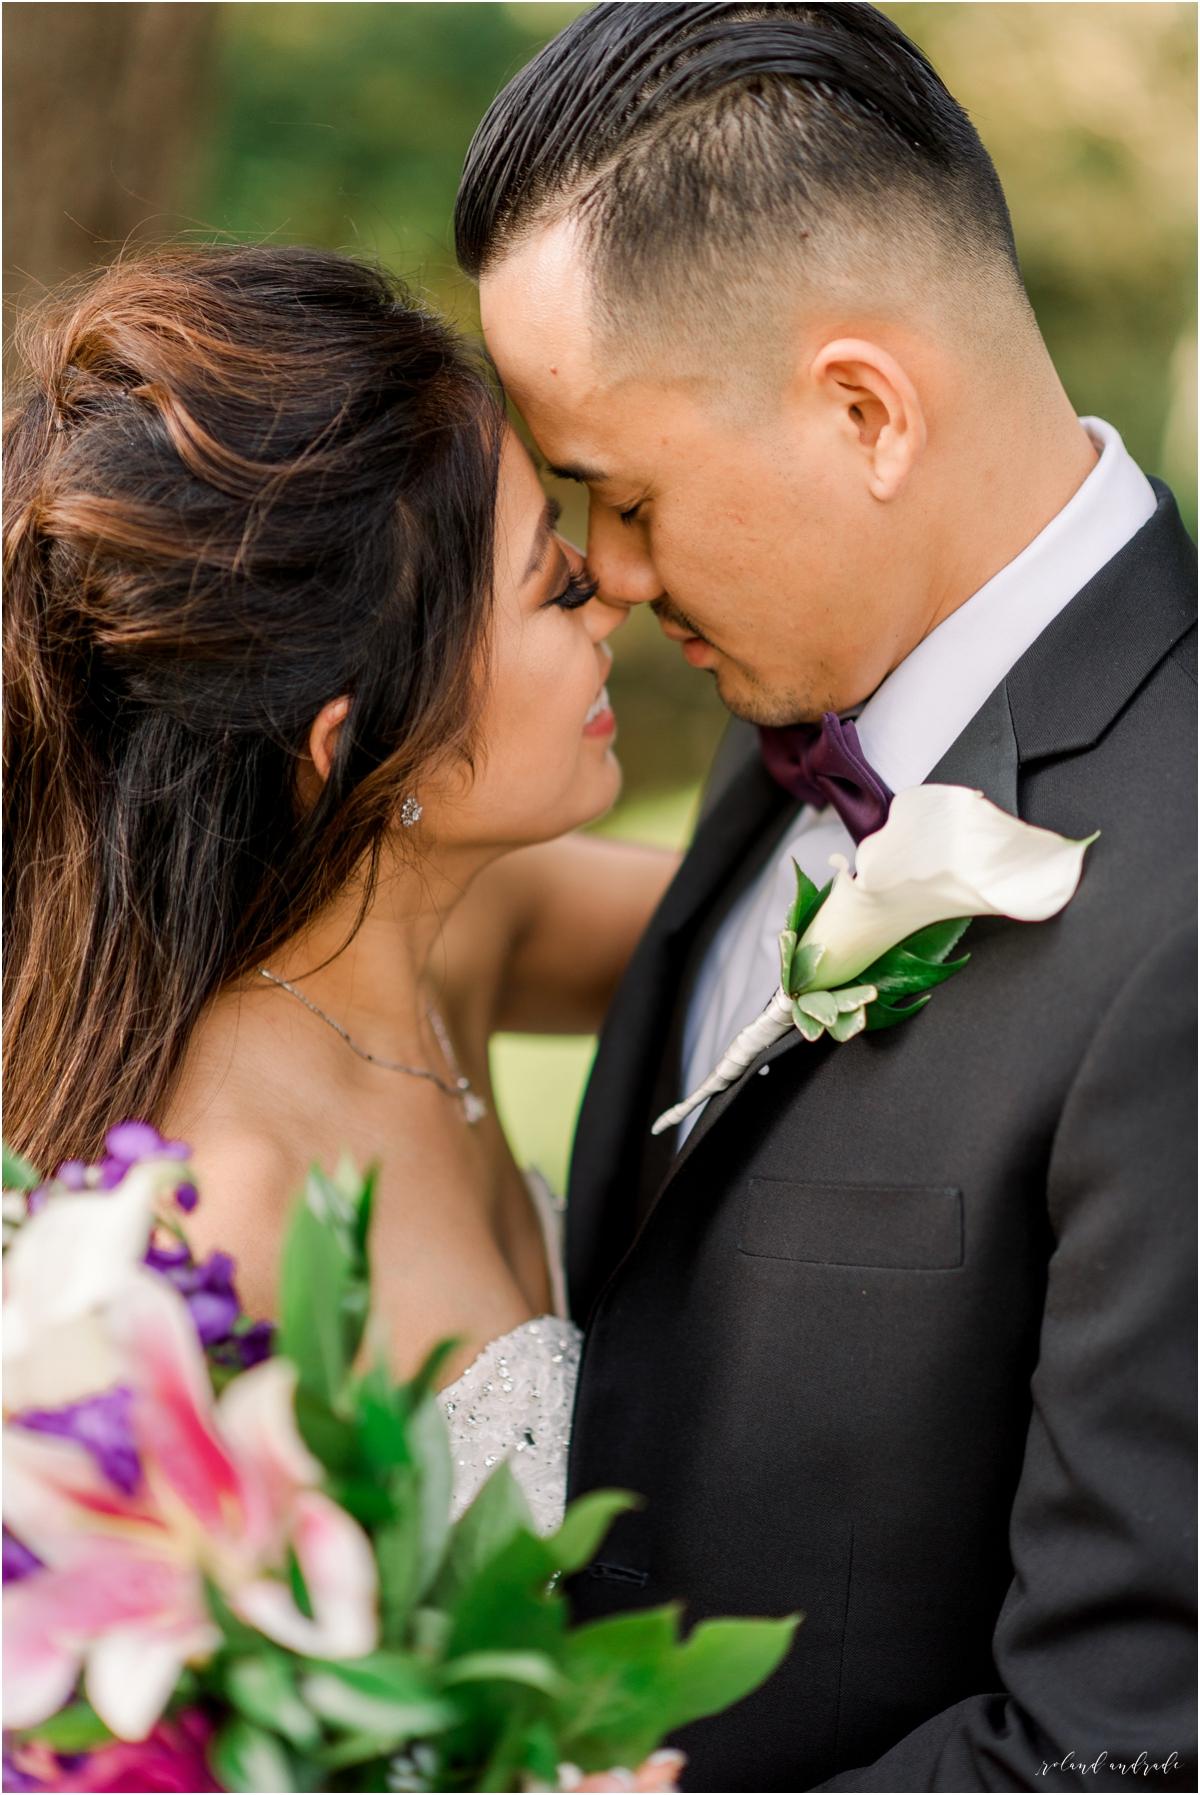 Meridian Banquets Wedding, Rolling Meadows Illinois Wedding, Chicago Wedding Photographer, Aurora Wedding Photographer, Best Photographer In Aurora, Best Photographer In Chicago_0107.jpg